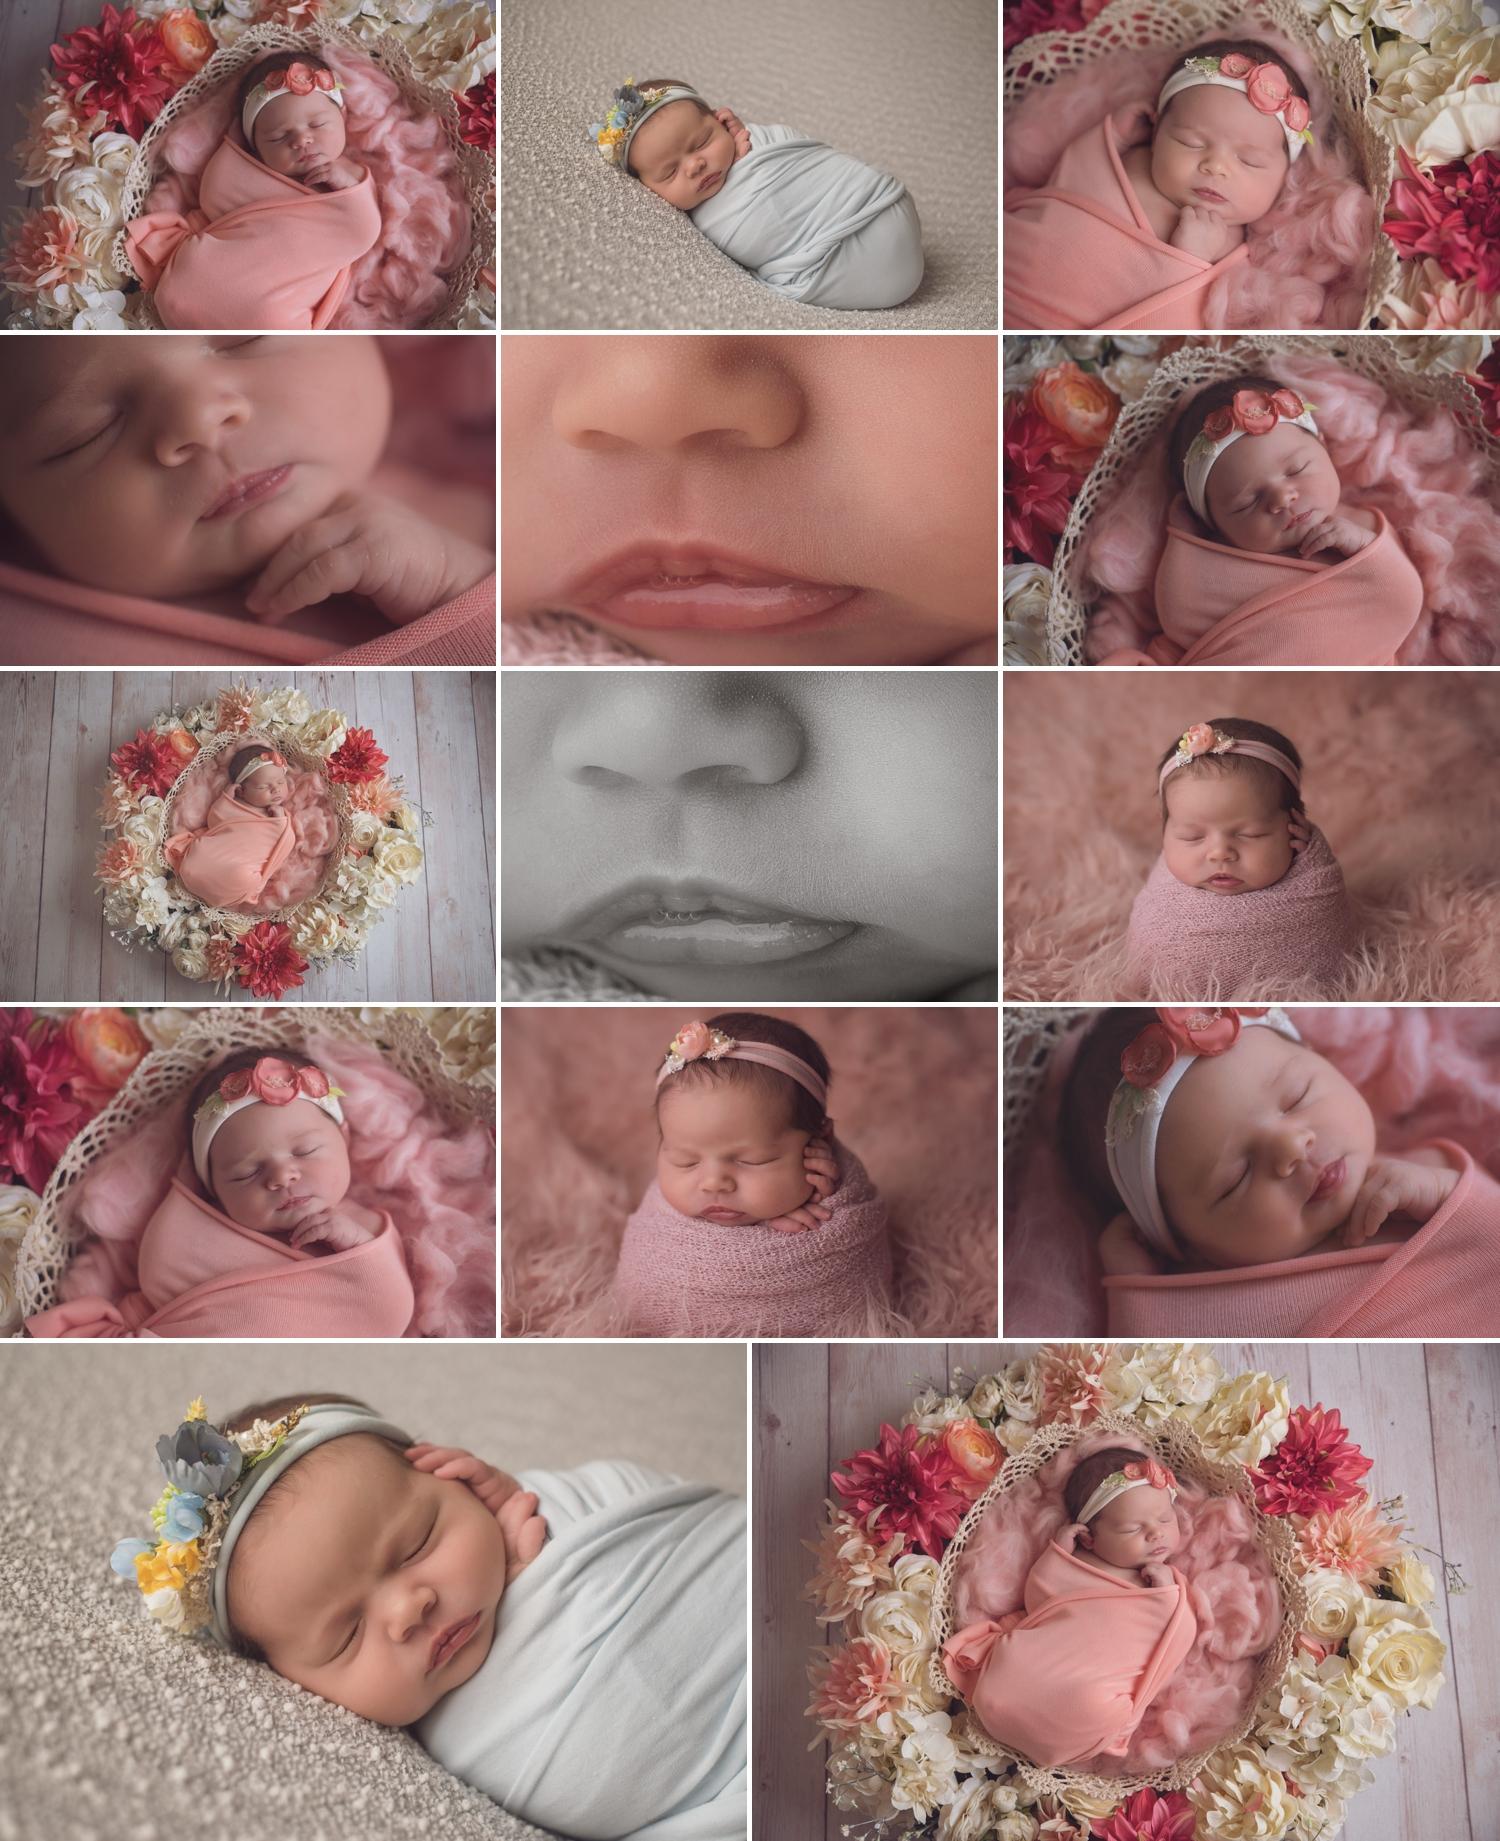 gardencity-newborn-photography 2.jpg